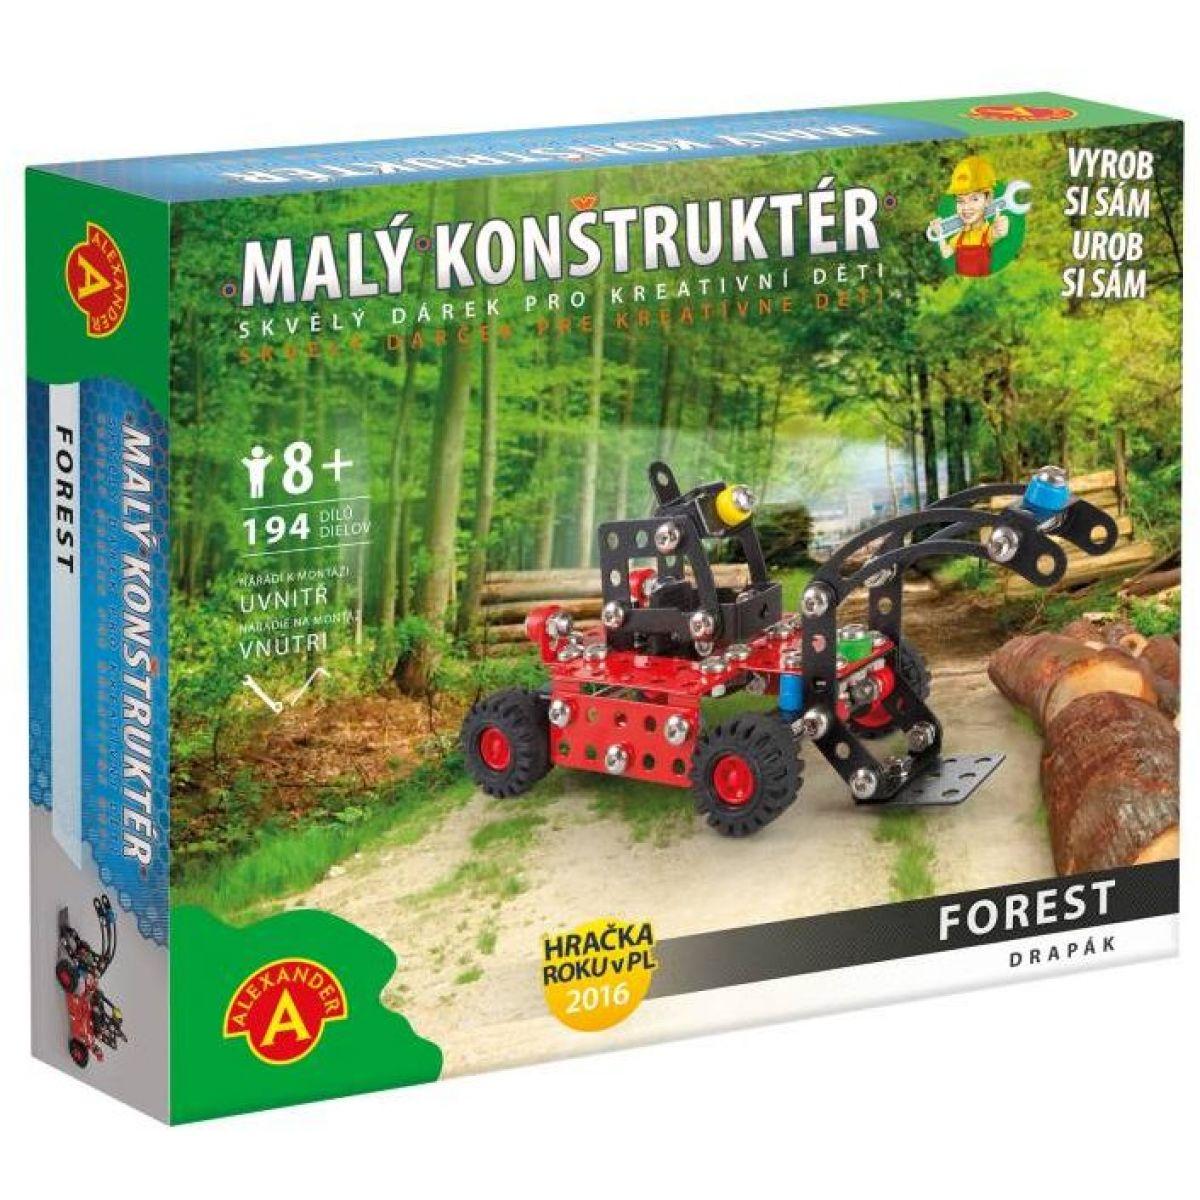 Alexander Malý konstruktér Forest Drapák